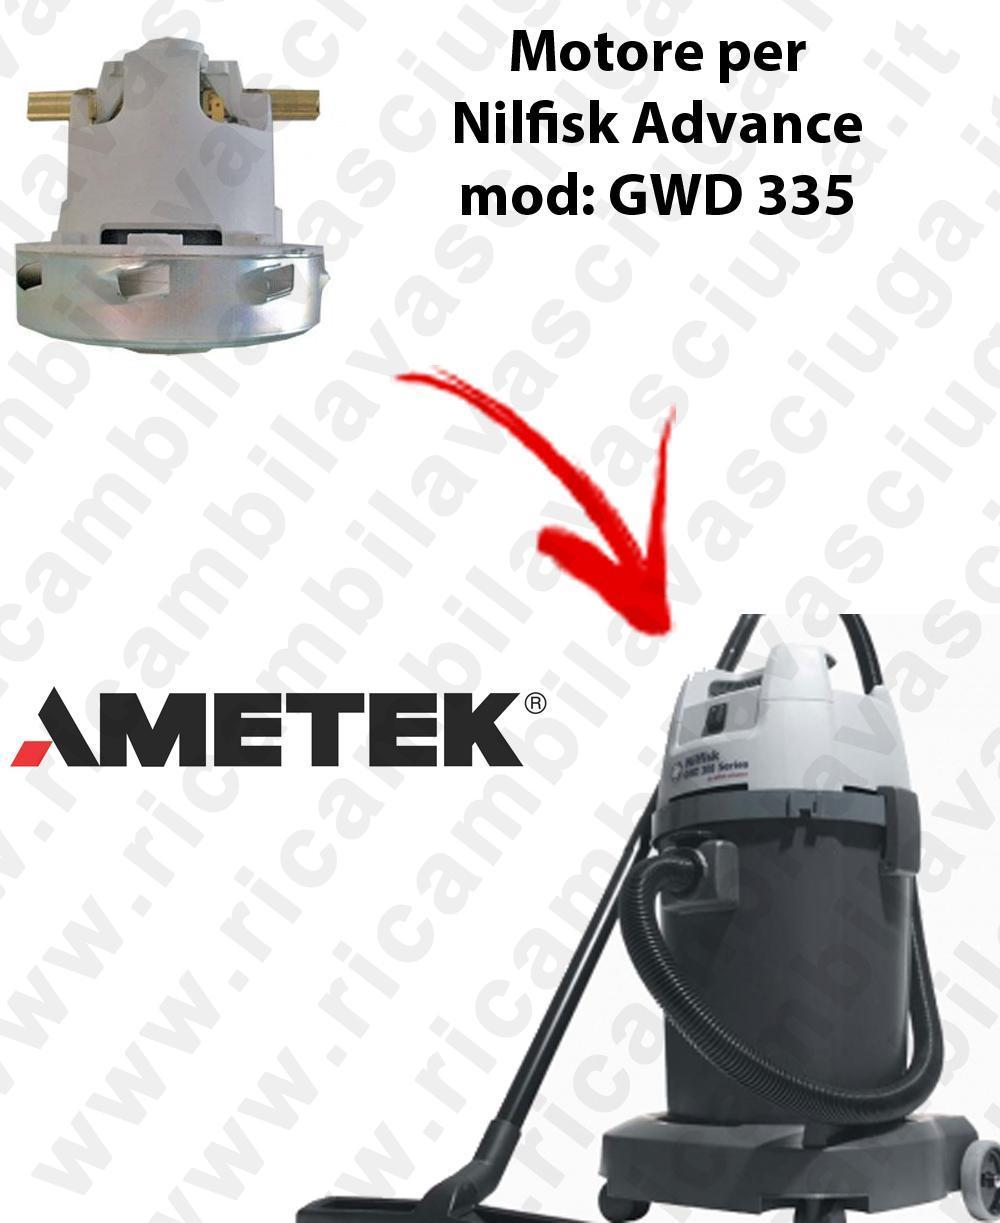 GWD 335  Motore de aspiración AMETEK para aspiradora Nilfisk Advance